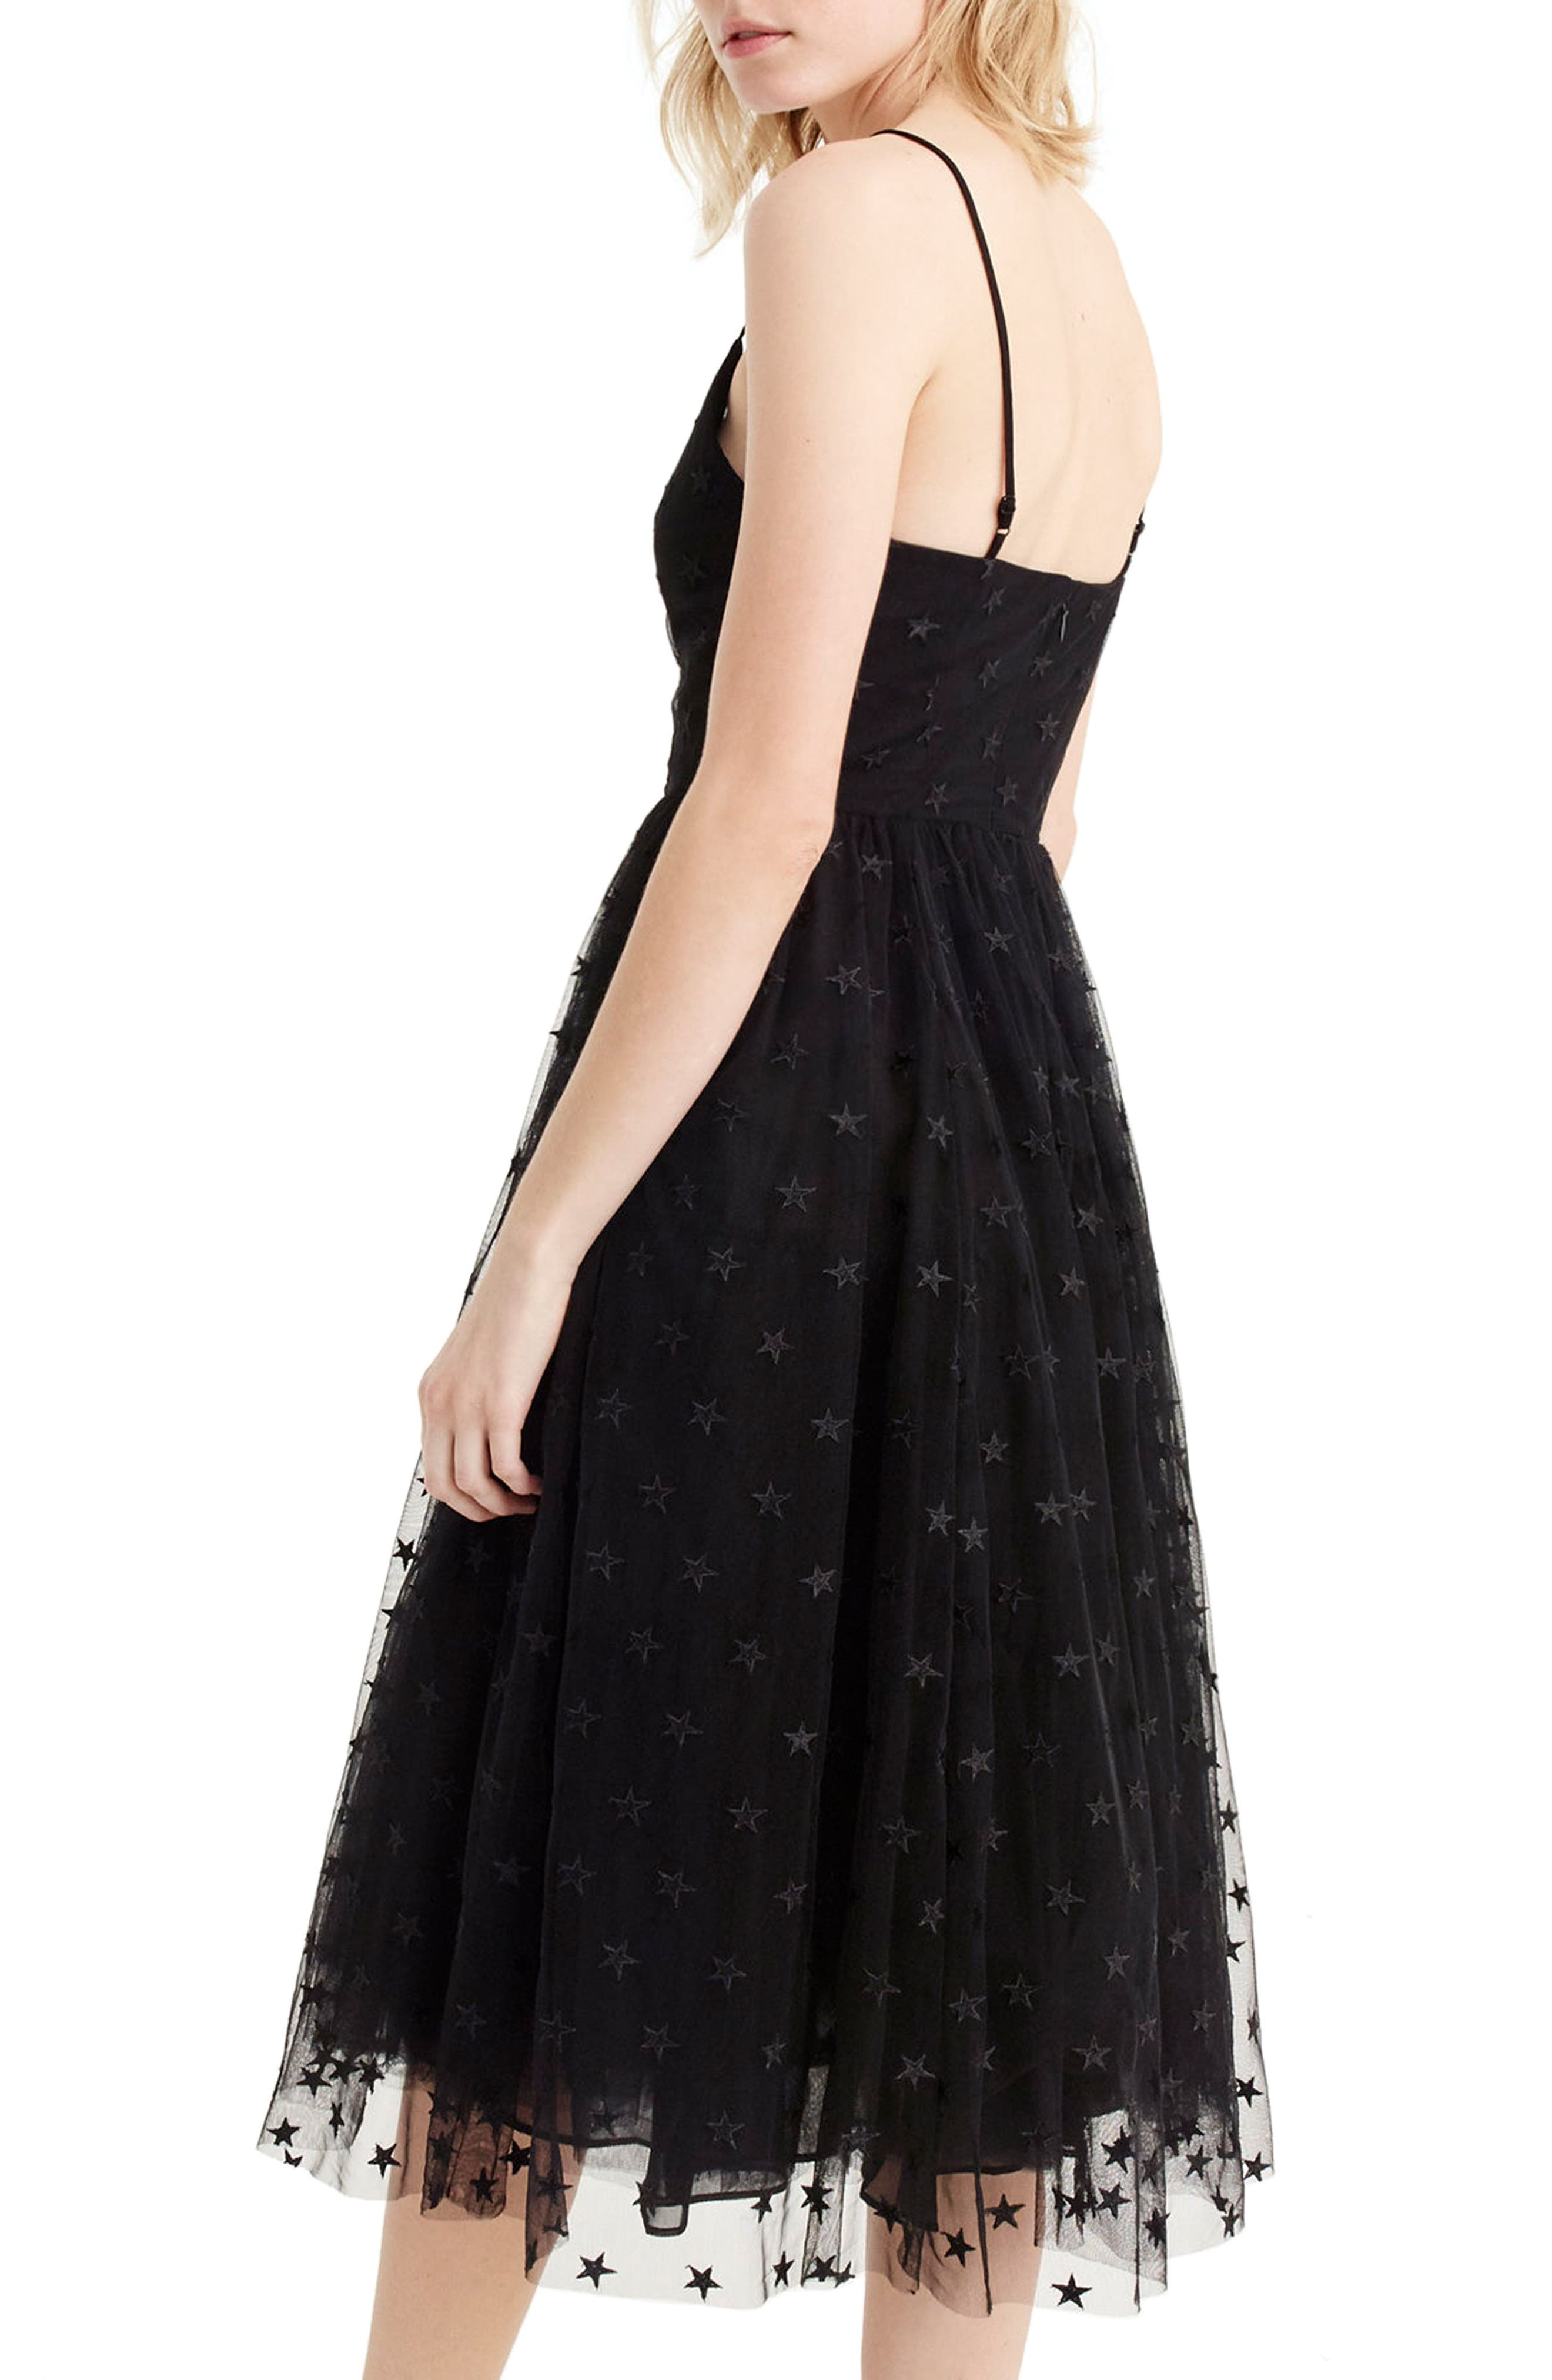 J.Crew Spaghetti Strap Star Tulle Dress,                             Alternate thumbnail 2, color,                             Black